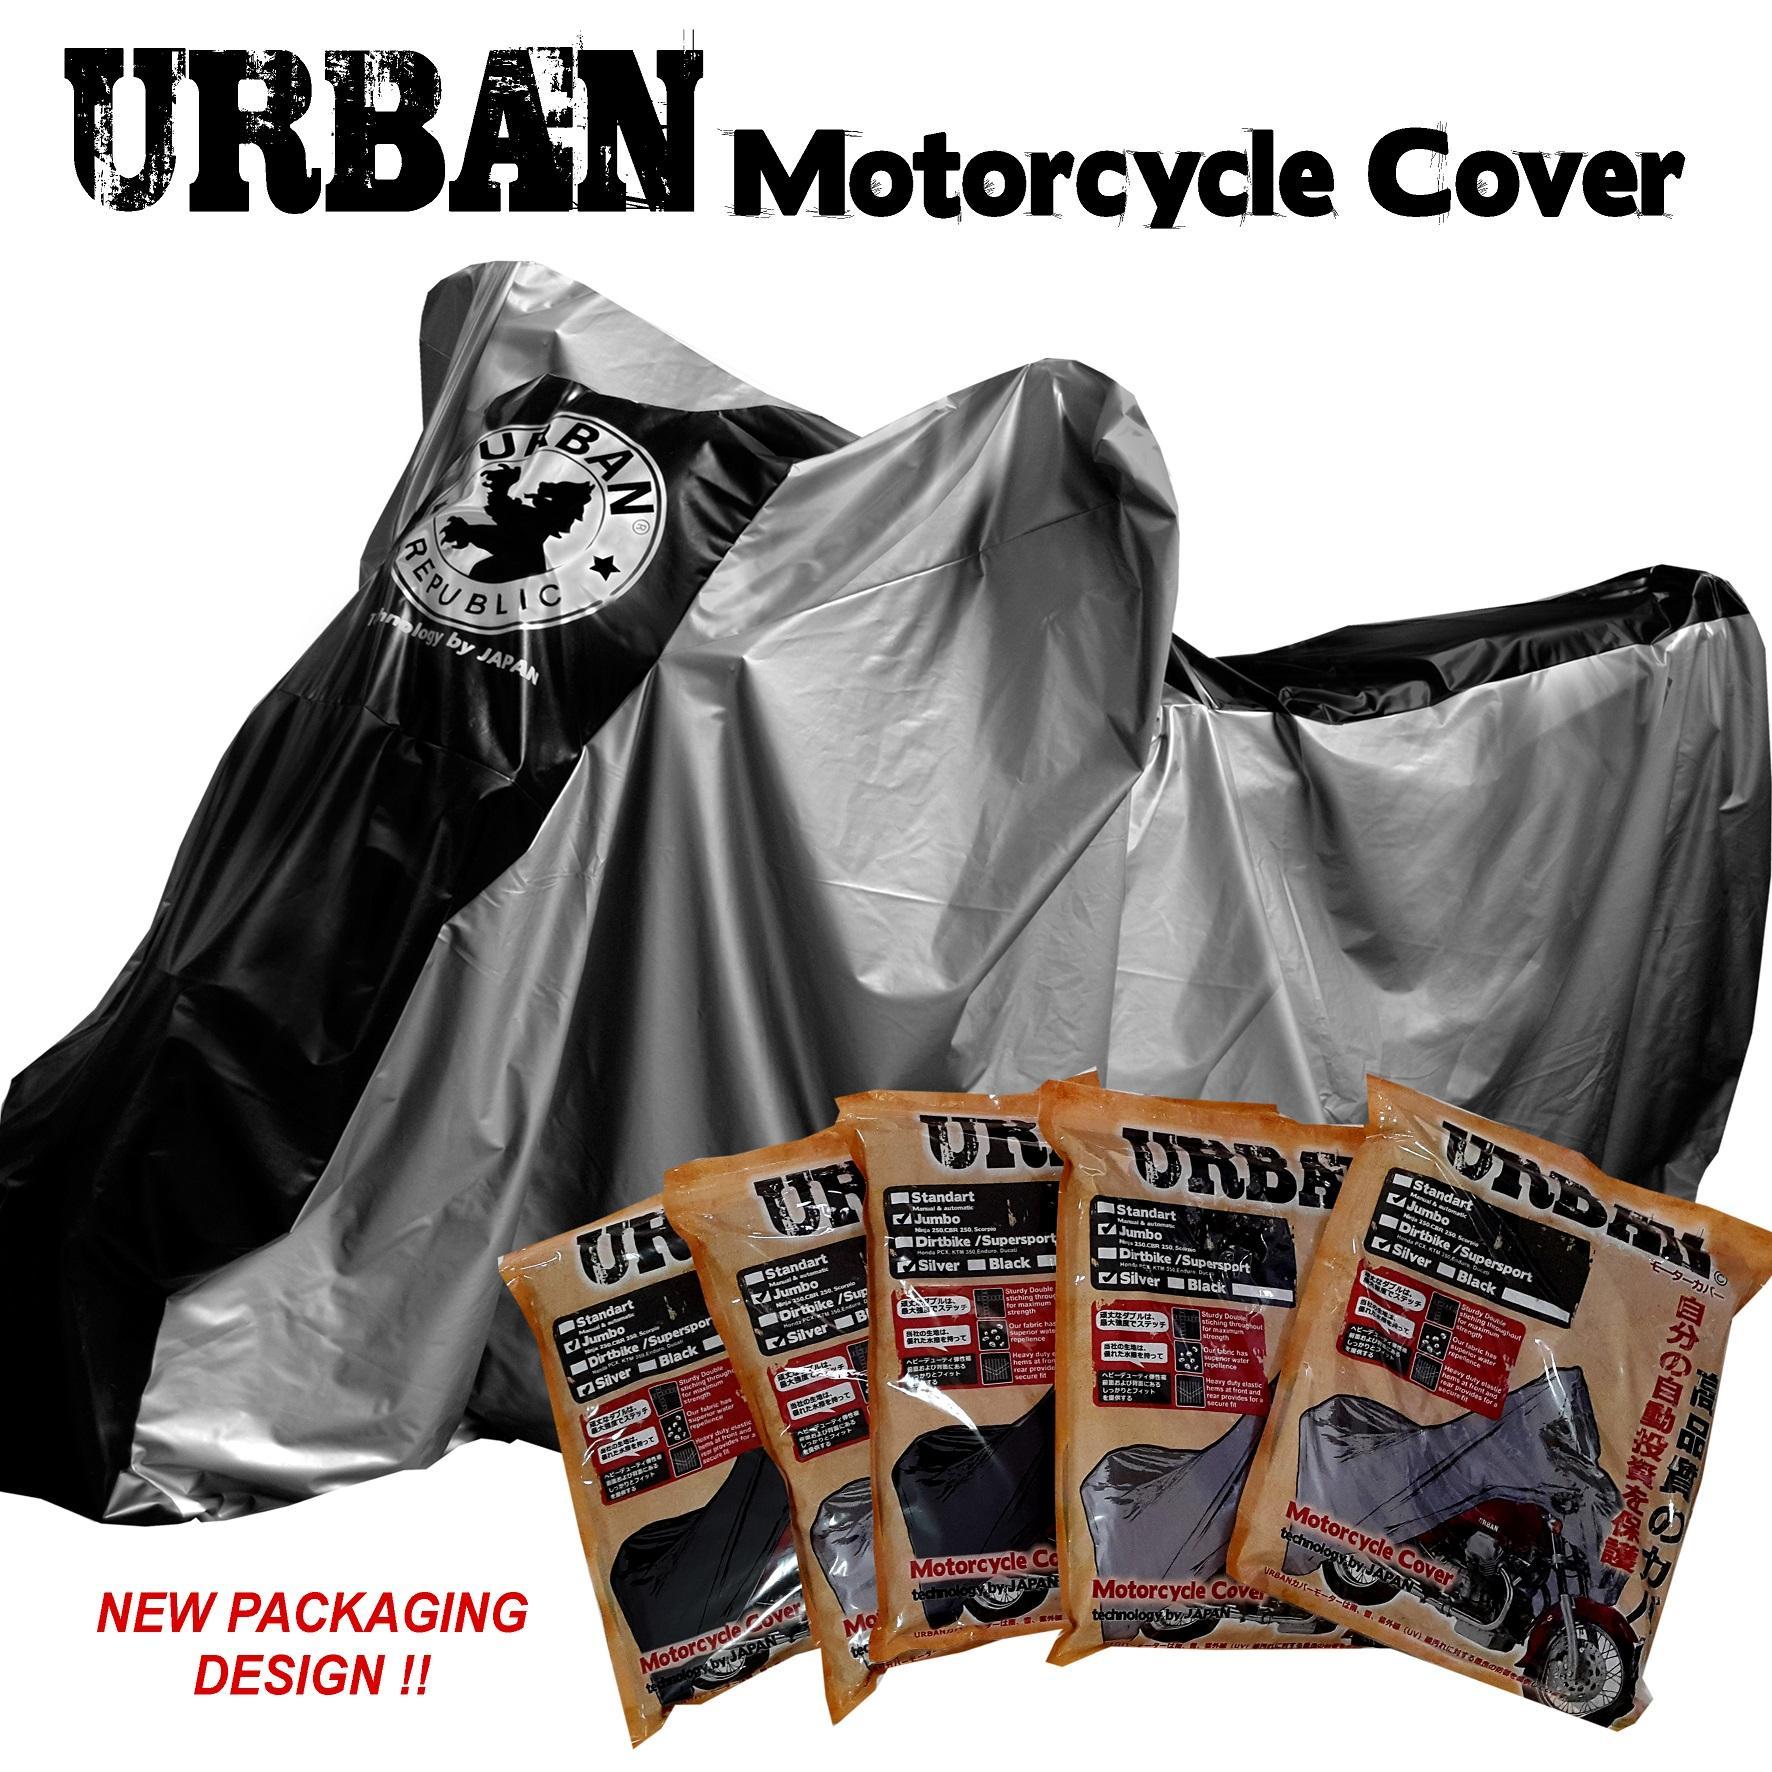 URBAN Cover Motor Bebek / Motor Matic Ukuran Small MIO, SCOOPY, VARIO, SUPRA, SATRIA FU, YAMAHA JUPITER